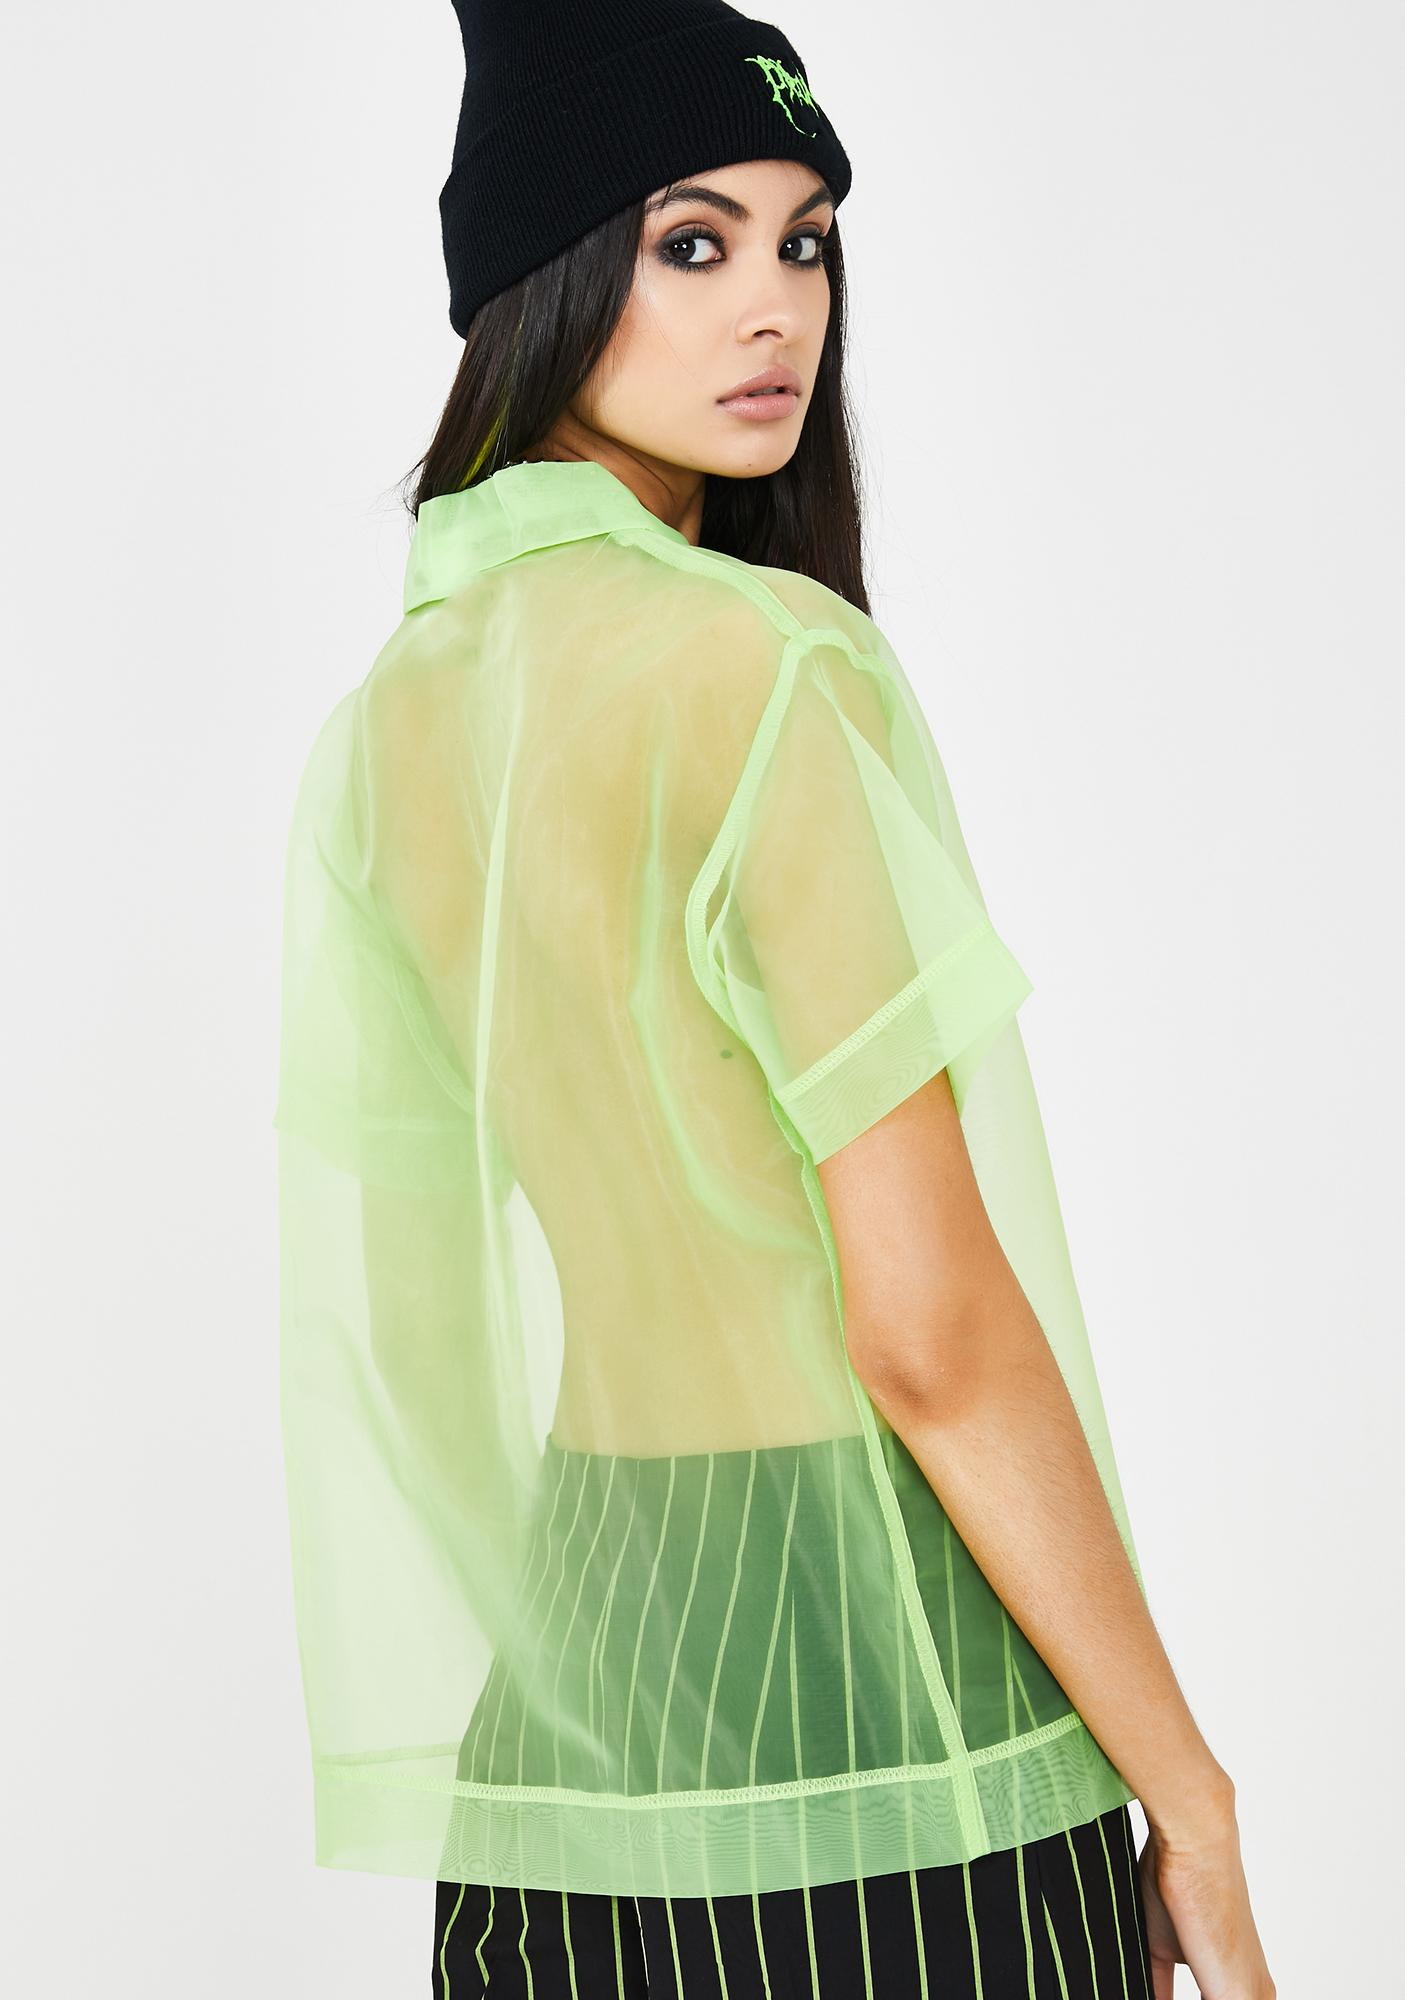 The Ragged Priest Tropics Shirt